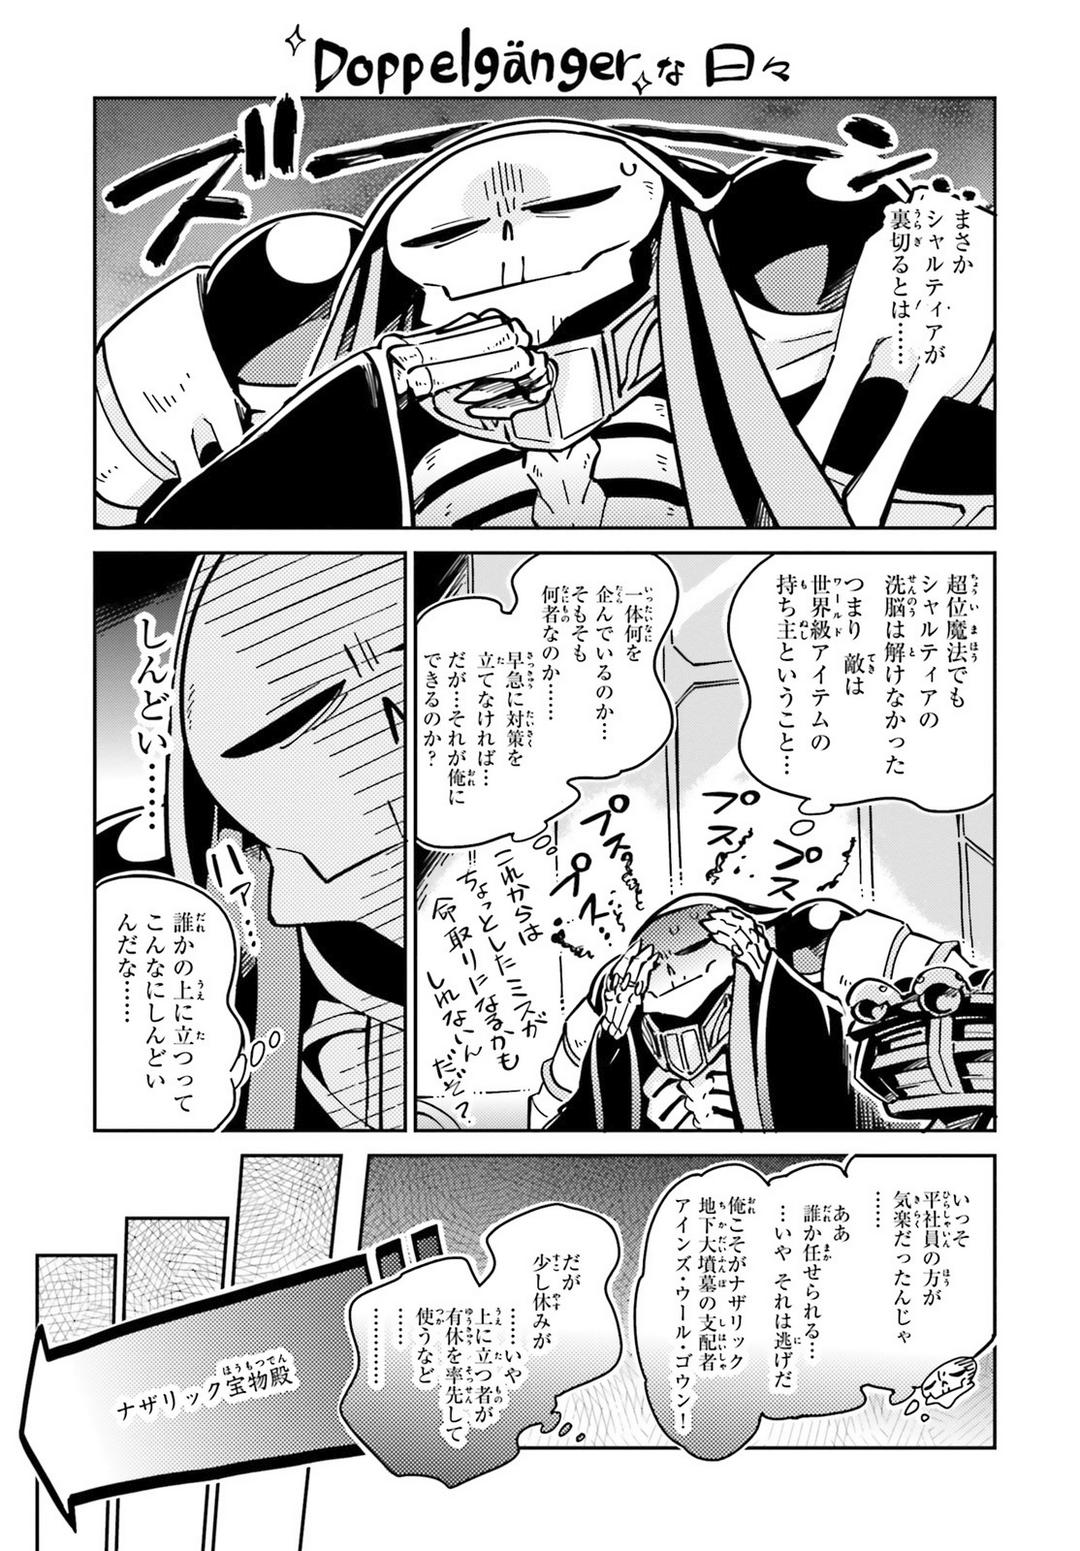 Overlord Blu-ray 05 Manga Special